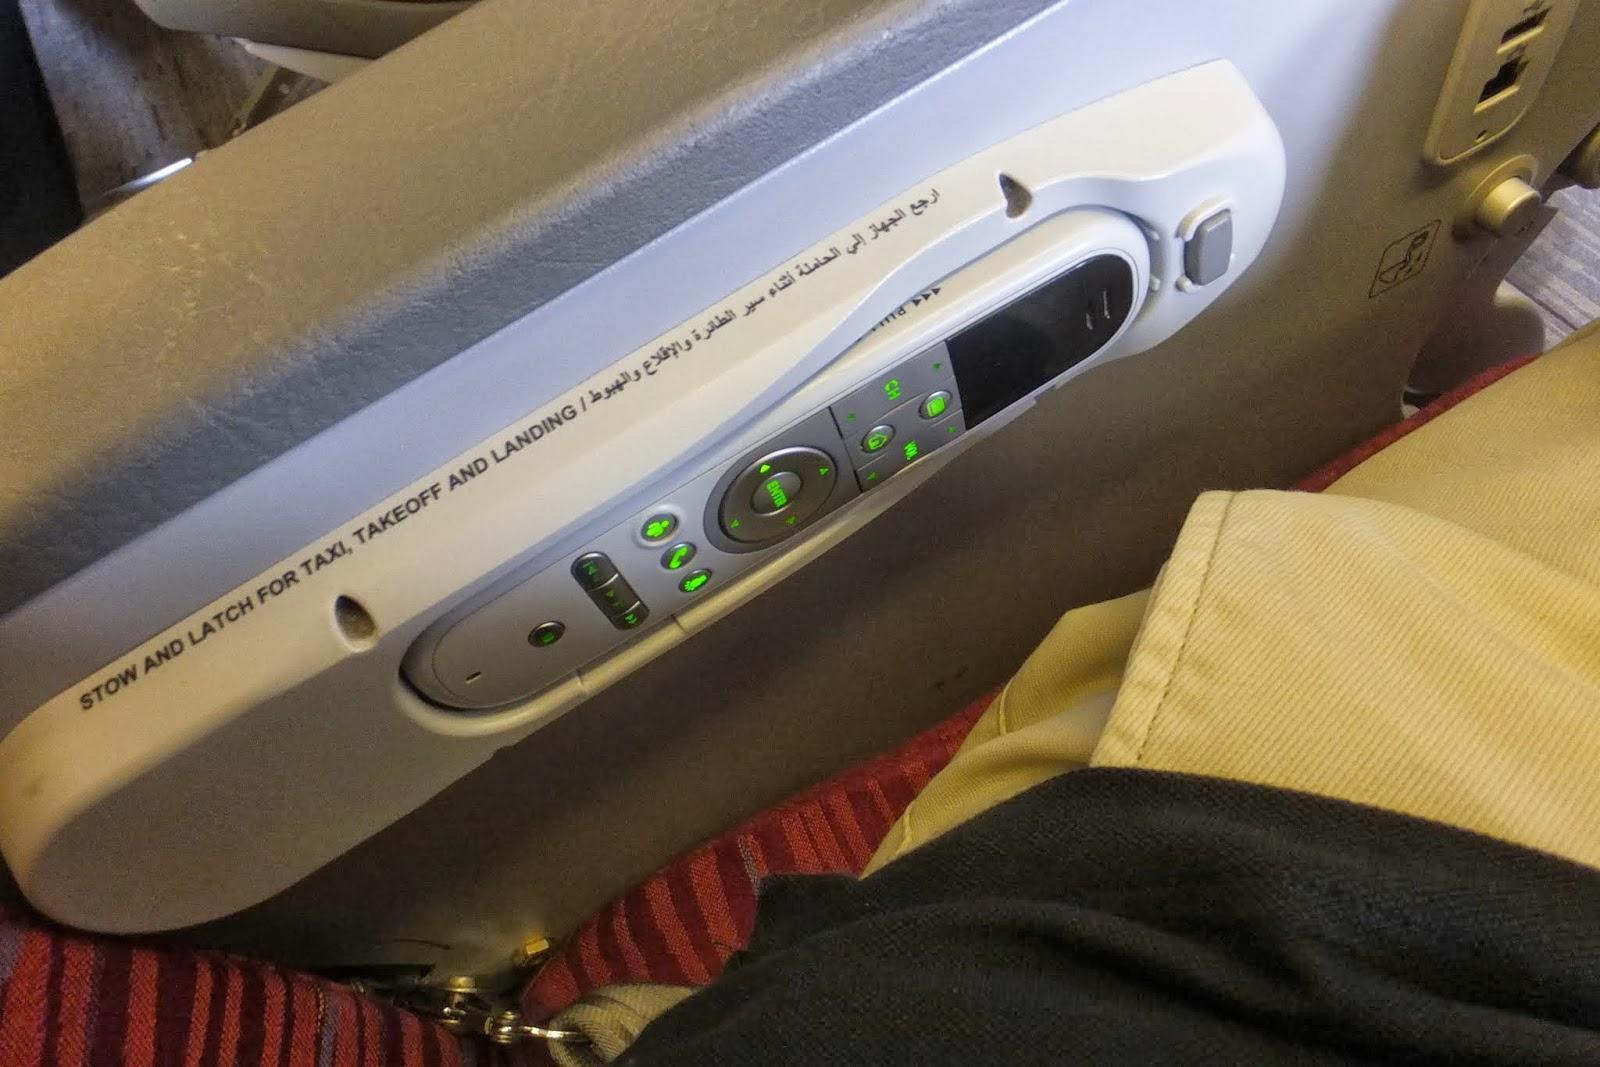 qatarairlines-seat-remote-control